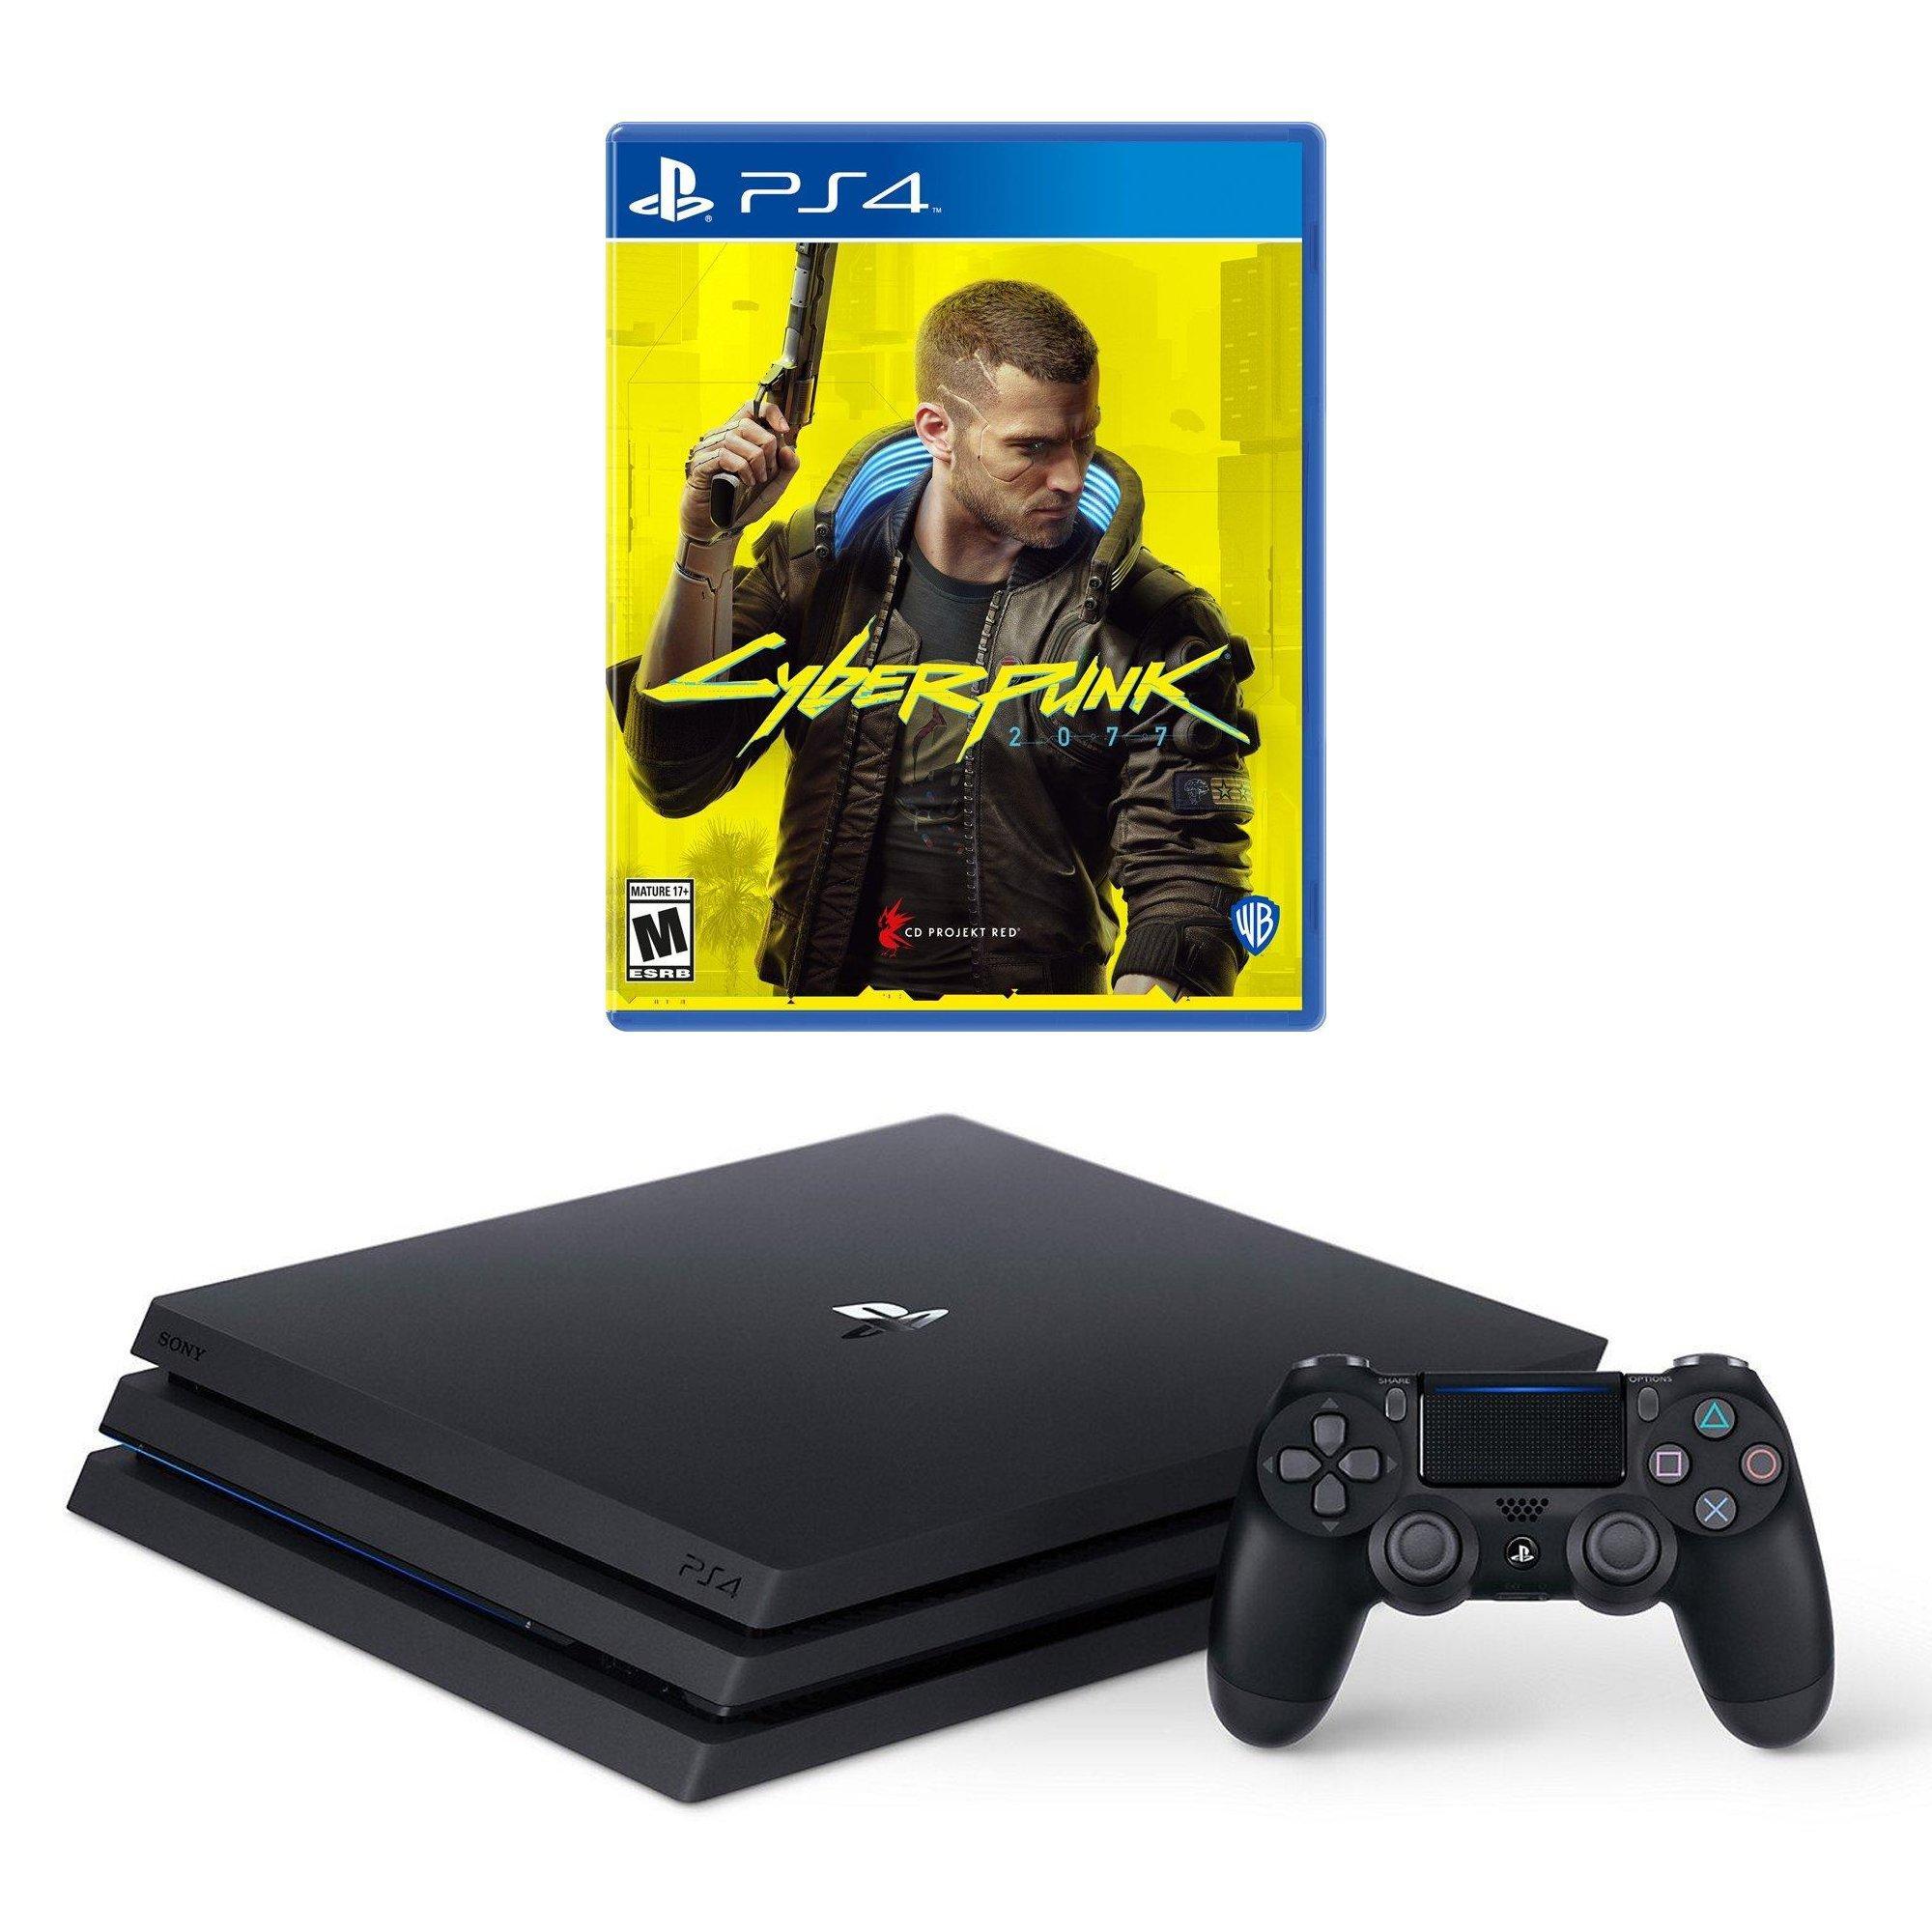 PlayStation 4 Pro and Cyberpunk 2077 System Bundle (GameStop Premium Refurbished)